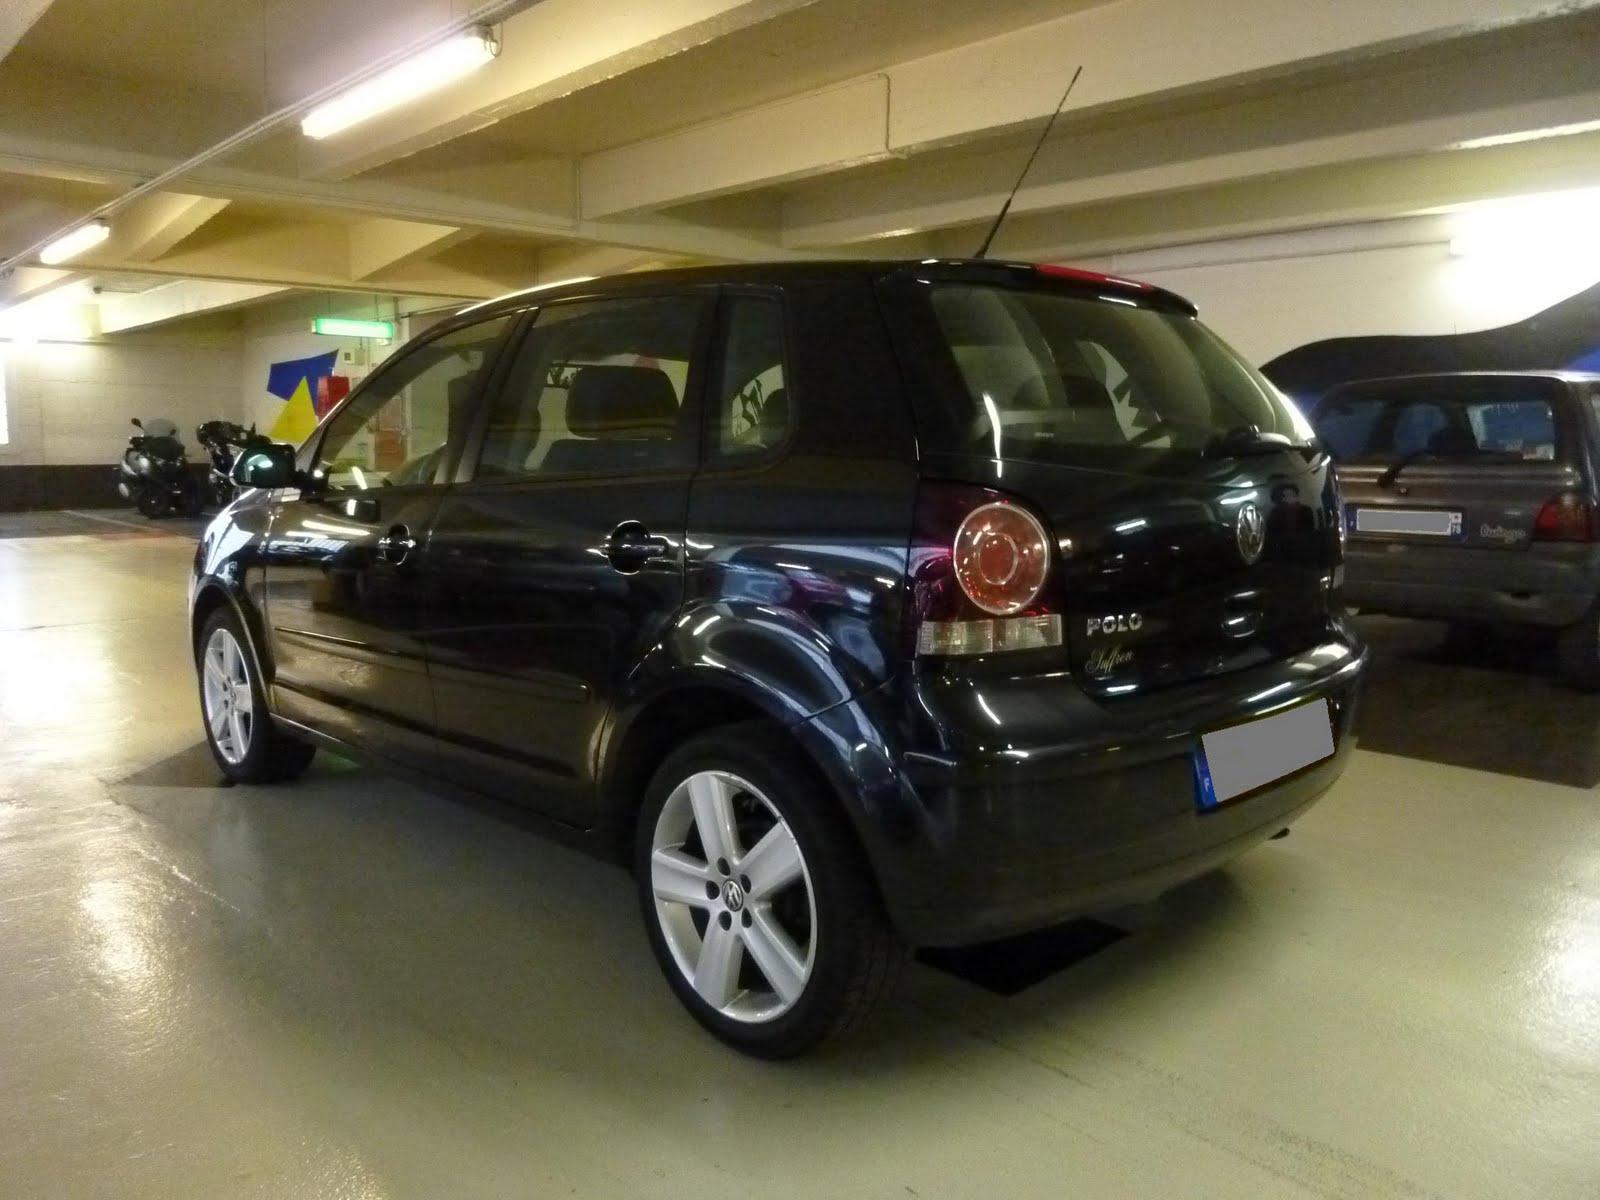 autocoach d p t vente automobile paris volkswagen polo iv tdi 80ch carat 2007. Black Bedroom Furniture Sets. Home Design Ideas